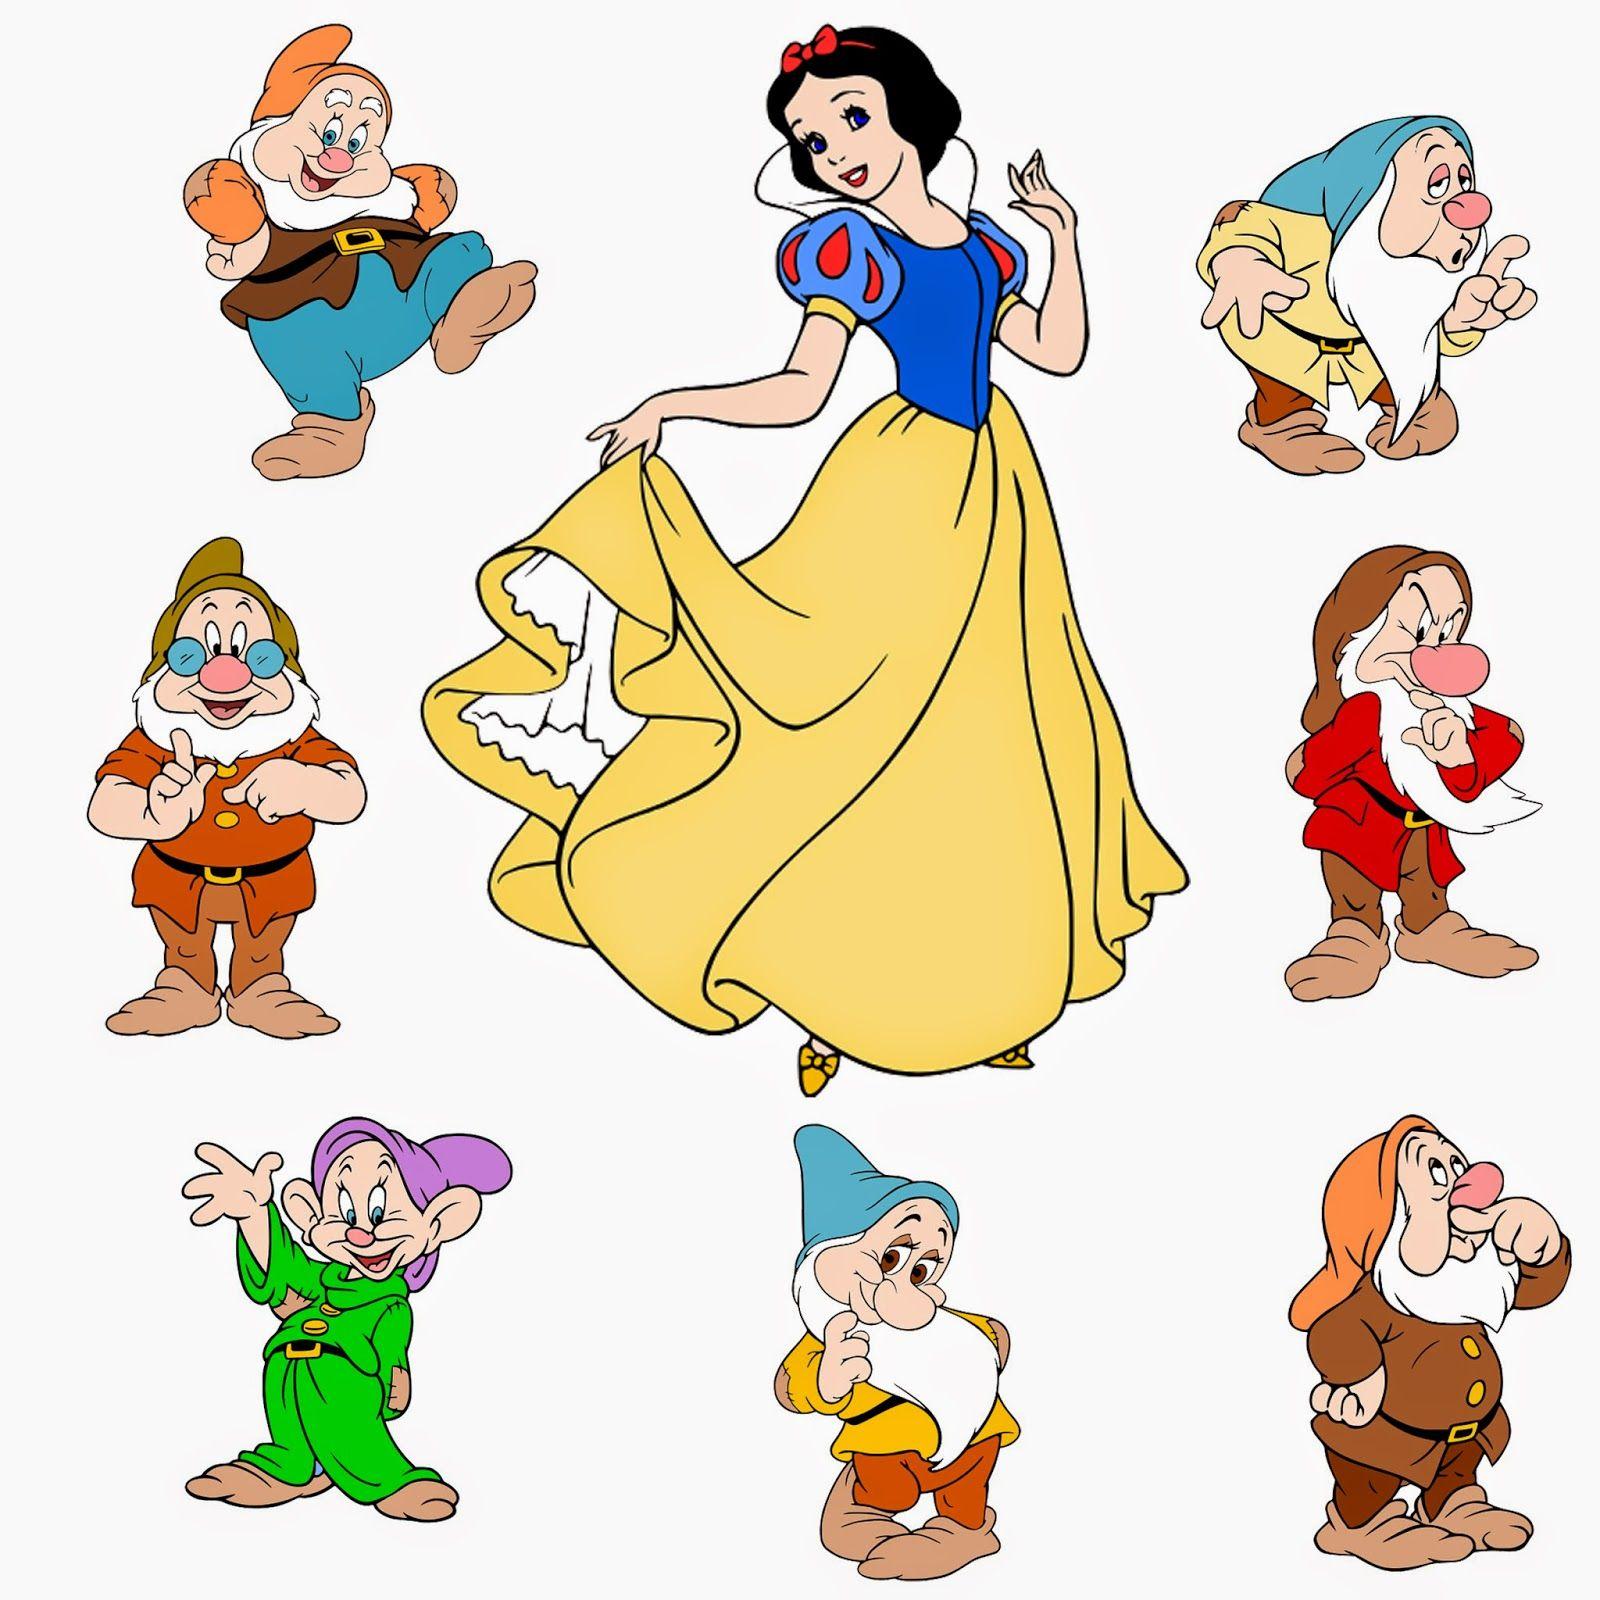 Snow white and the seven dwarfs clipart black and white stock Krafty Nook: Disney\'s Snow White and the Seven Dwarfs SVG ... black and white stock